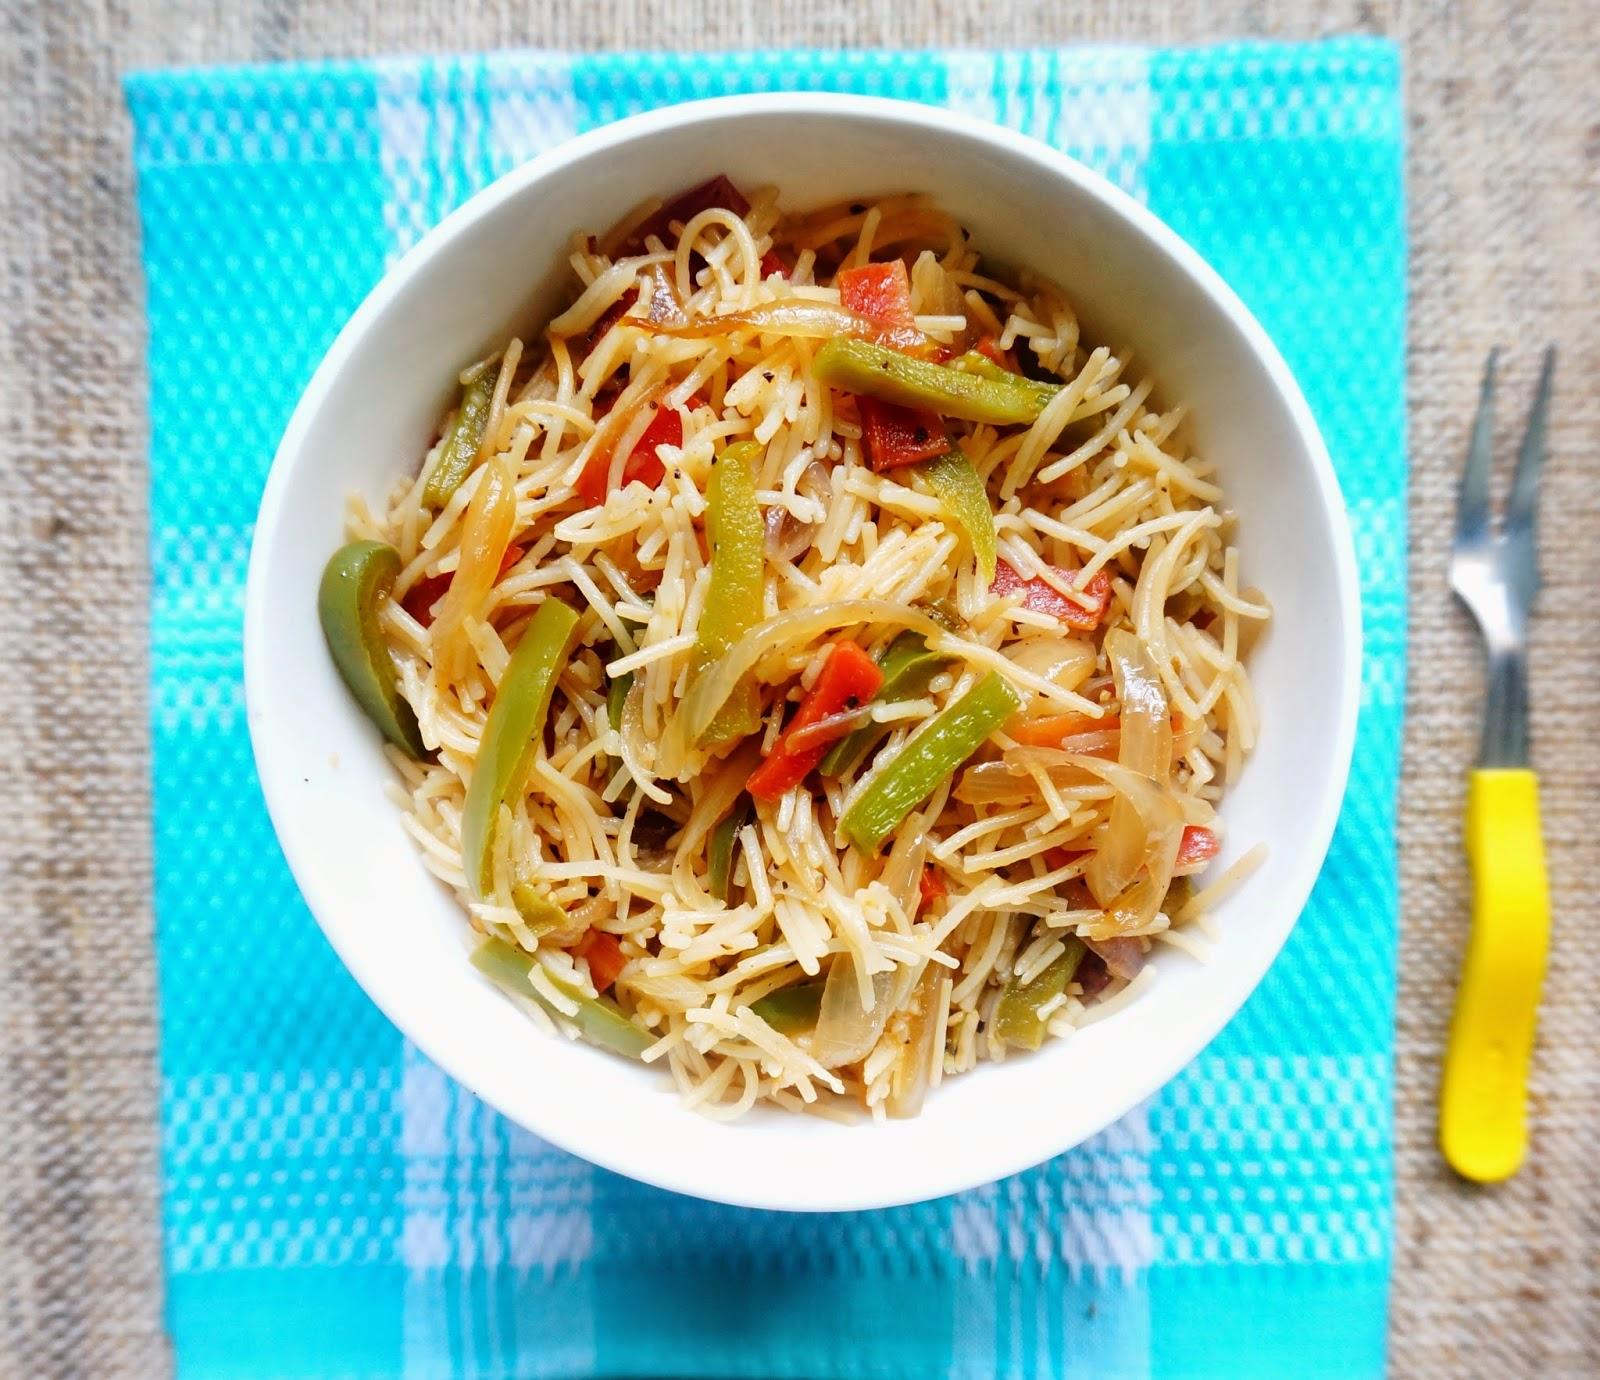 Semolina vermicelli,Sooji upma,upma,bambino,vermicelli,noodles